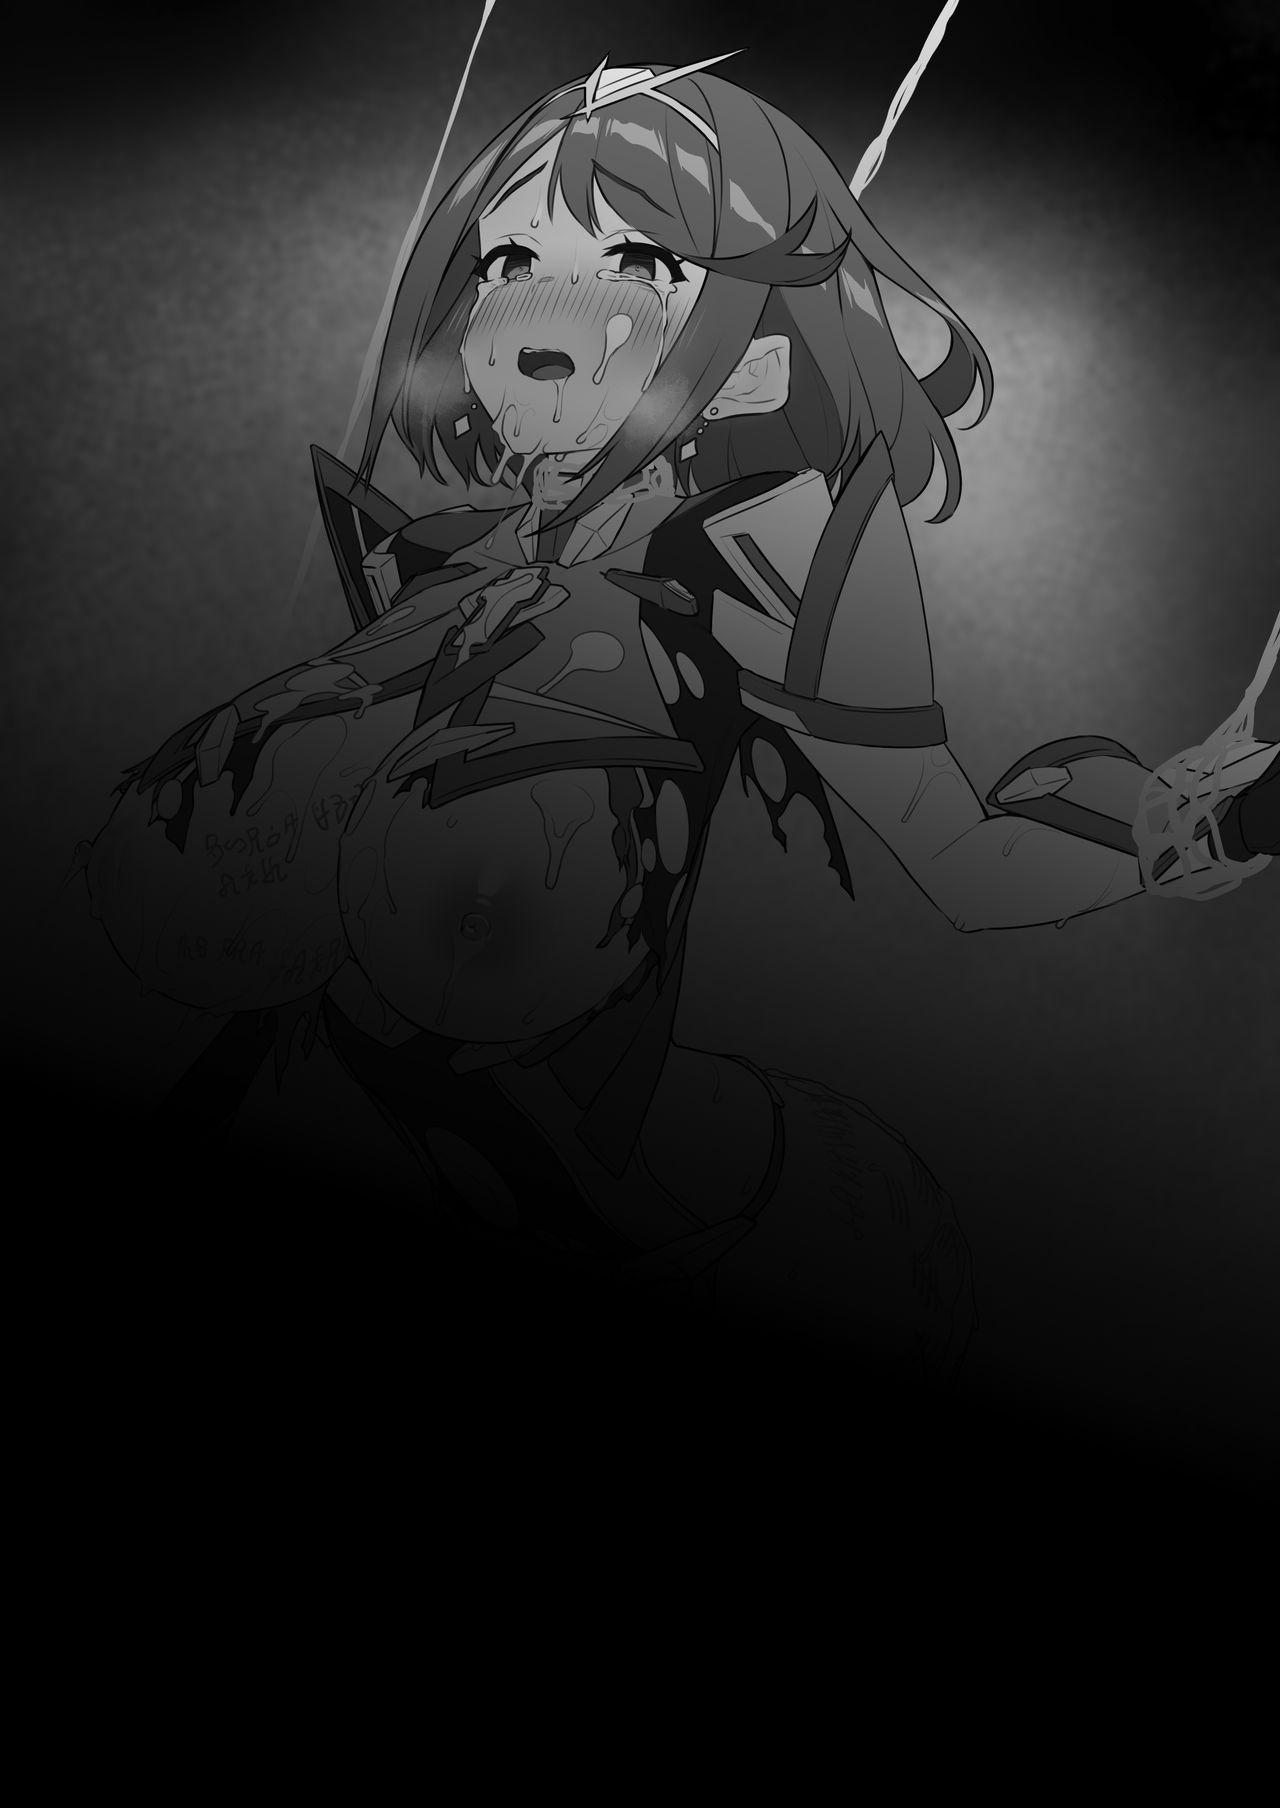 Homura-chan no Junan | Pyra's Suffering 39